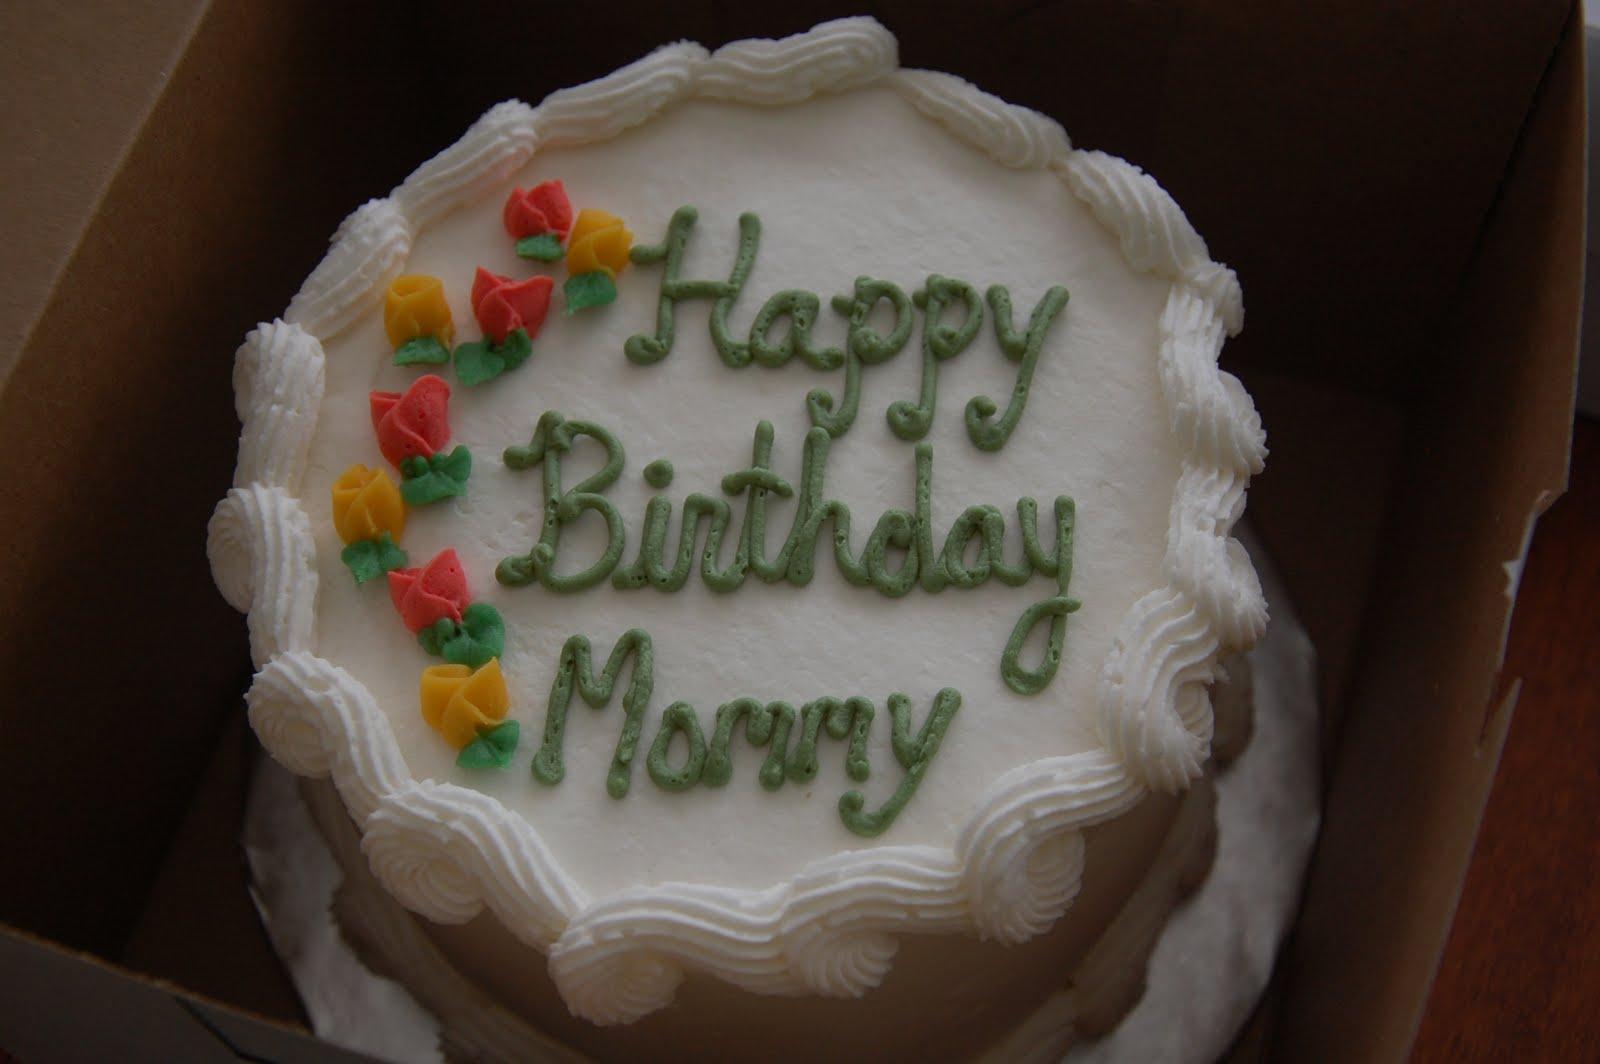 Angela Bartons Cakes: Birthday Blessings